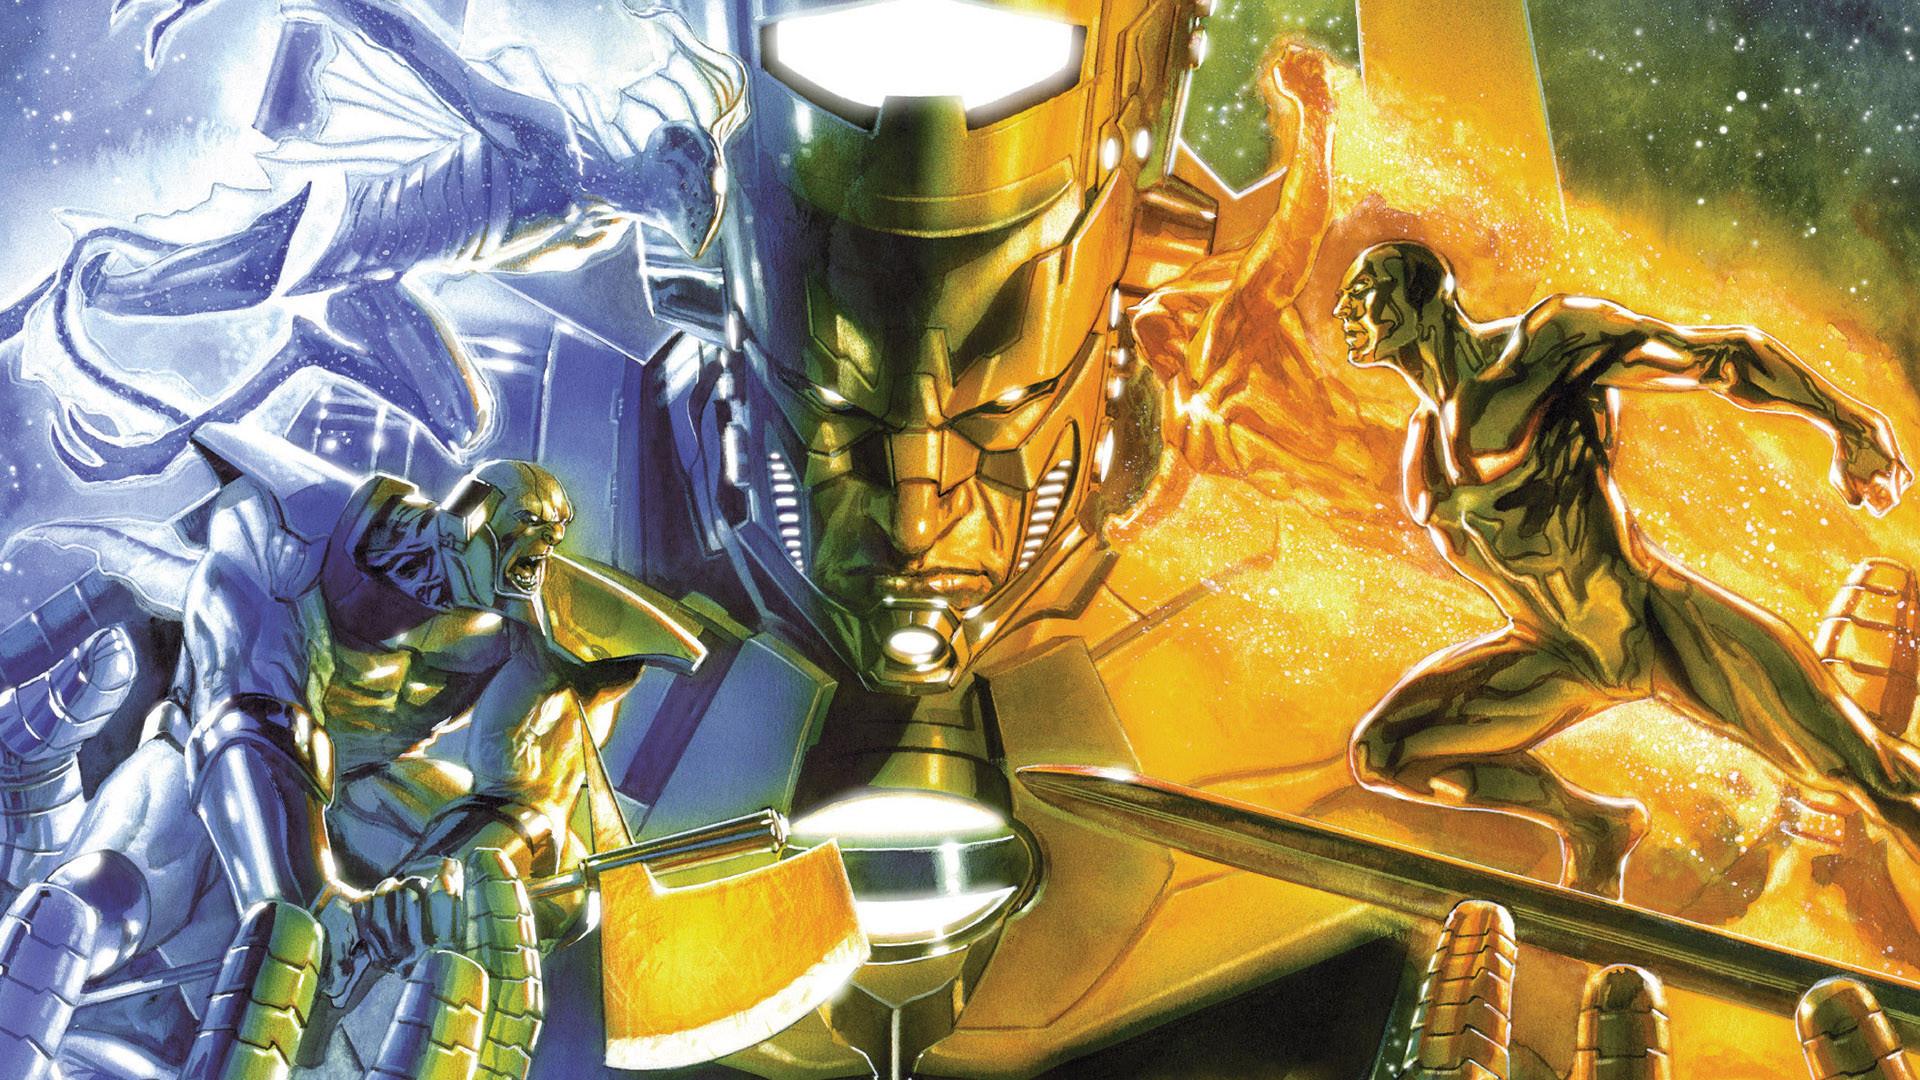 Galactus Marvel Silver Surfer wallpaper     70725   WallpaperUP